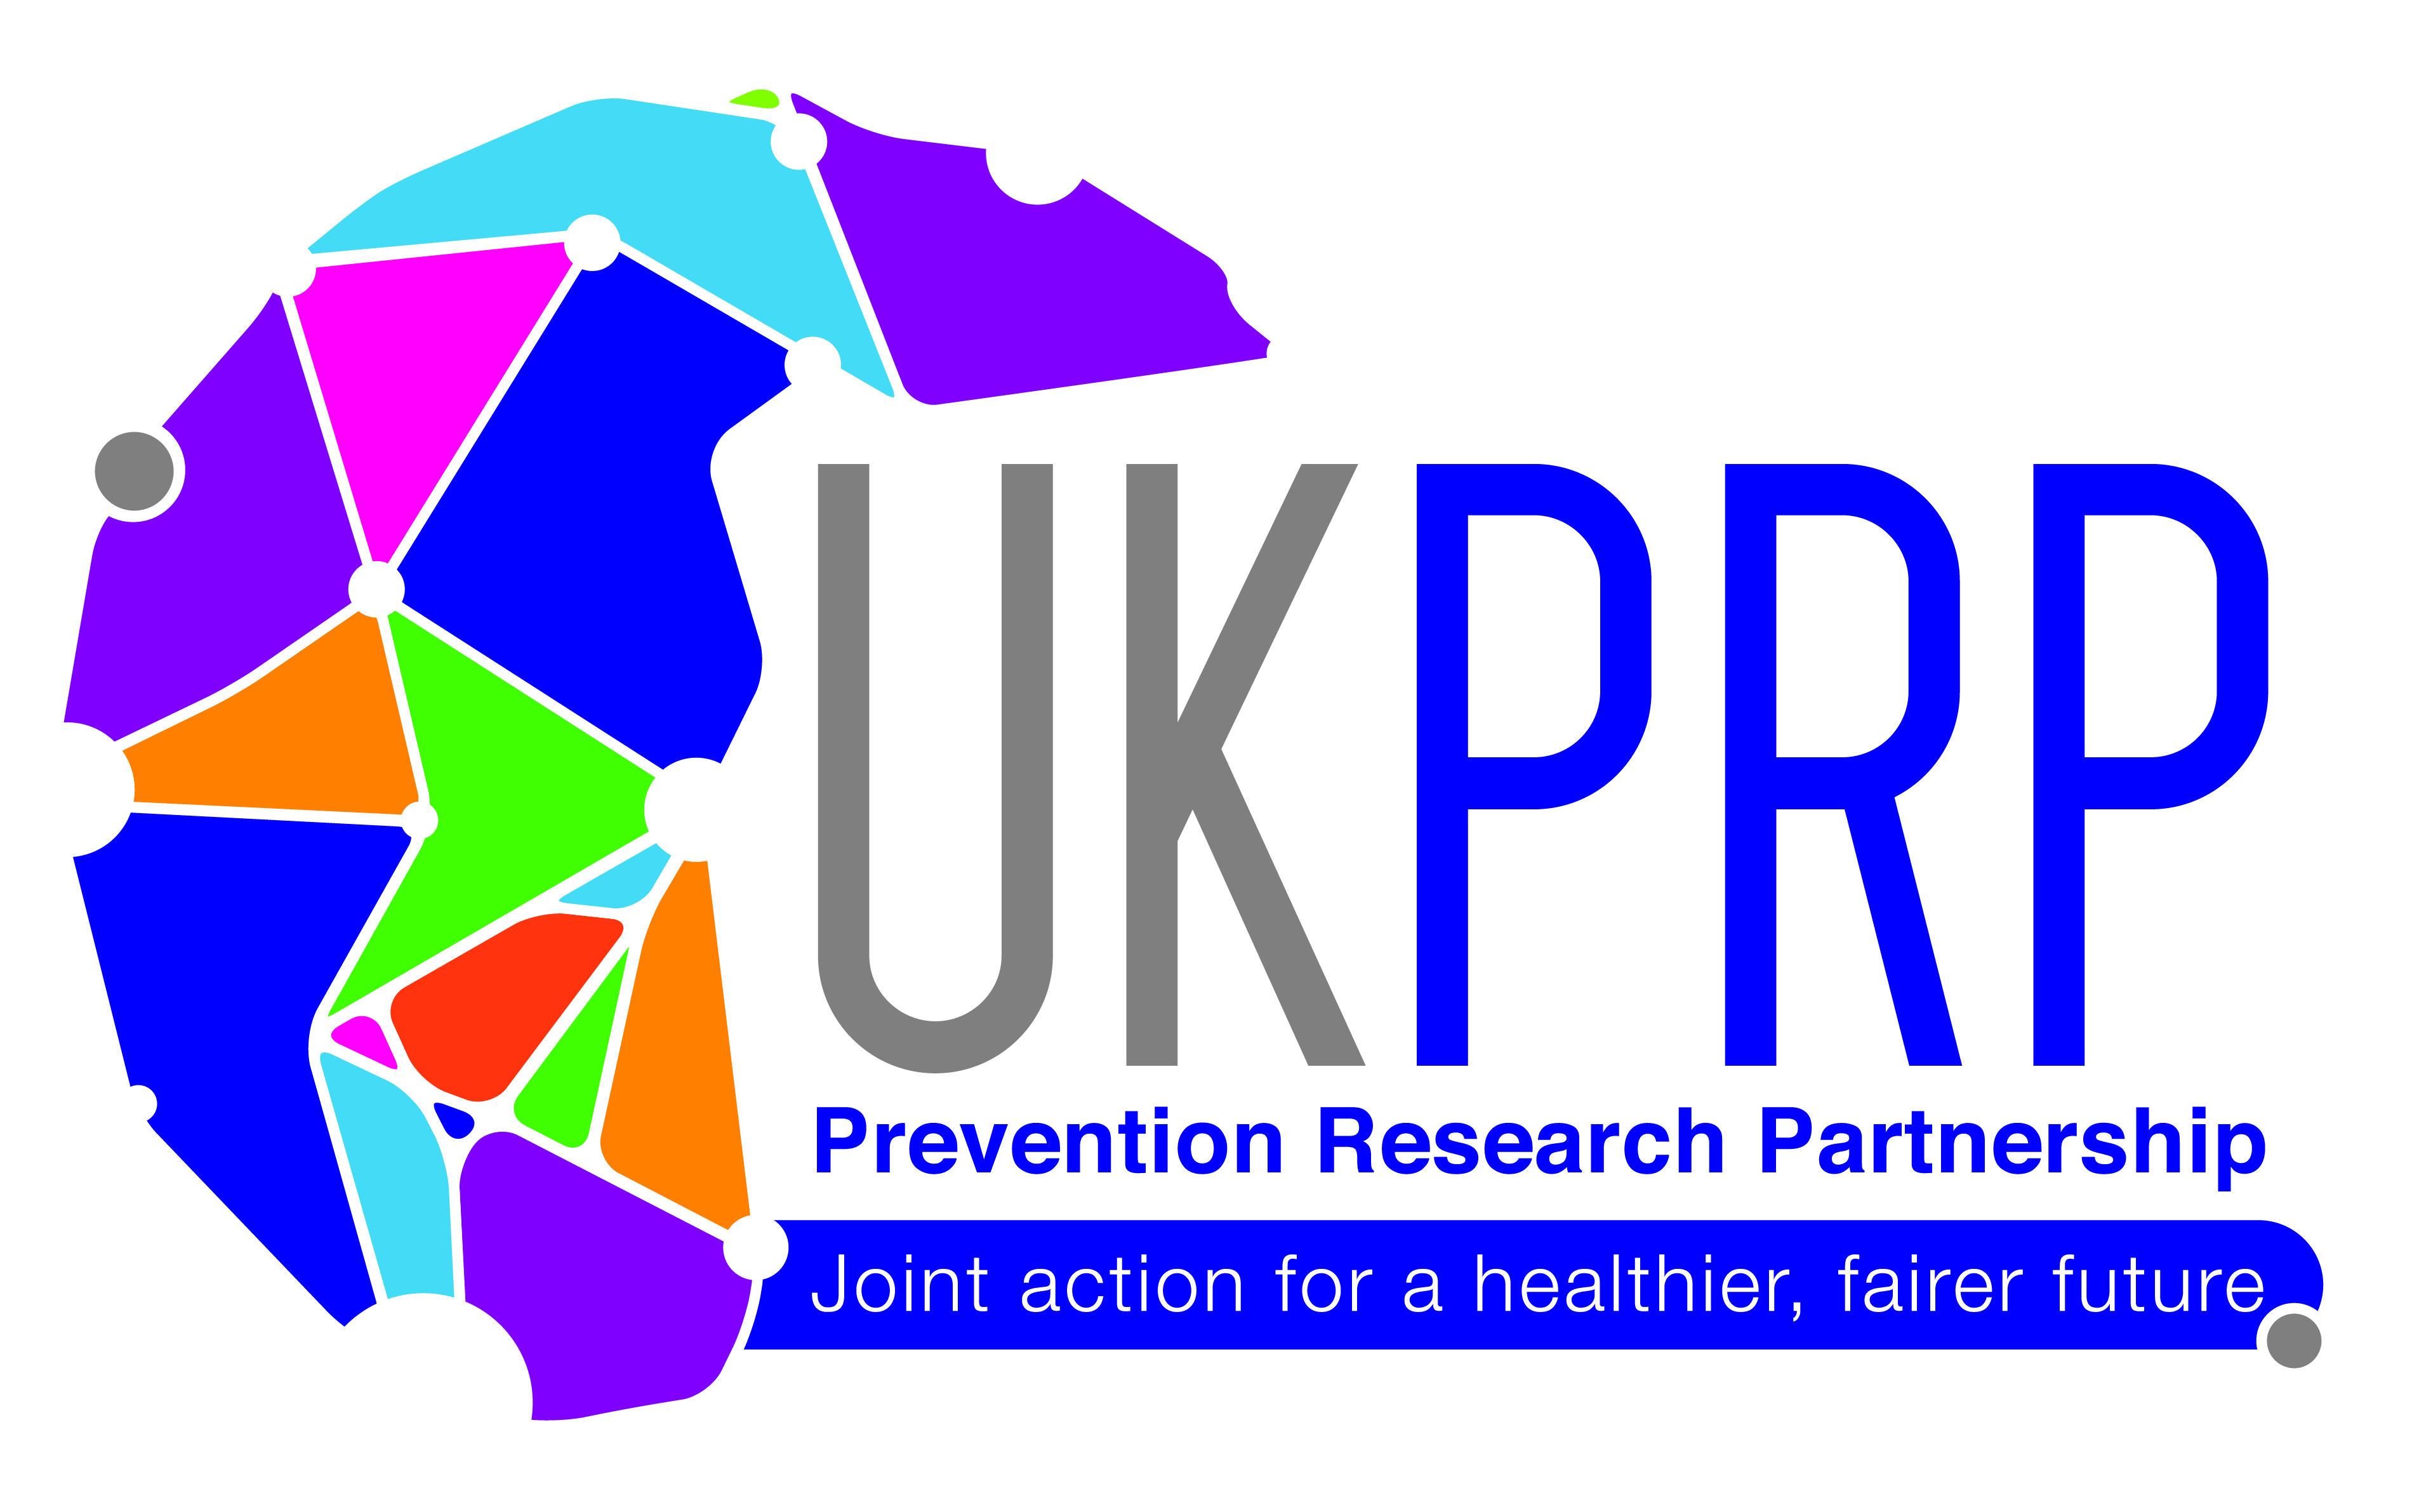 UK Prevention Research Partnership (UKPRP)